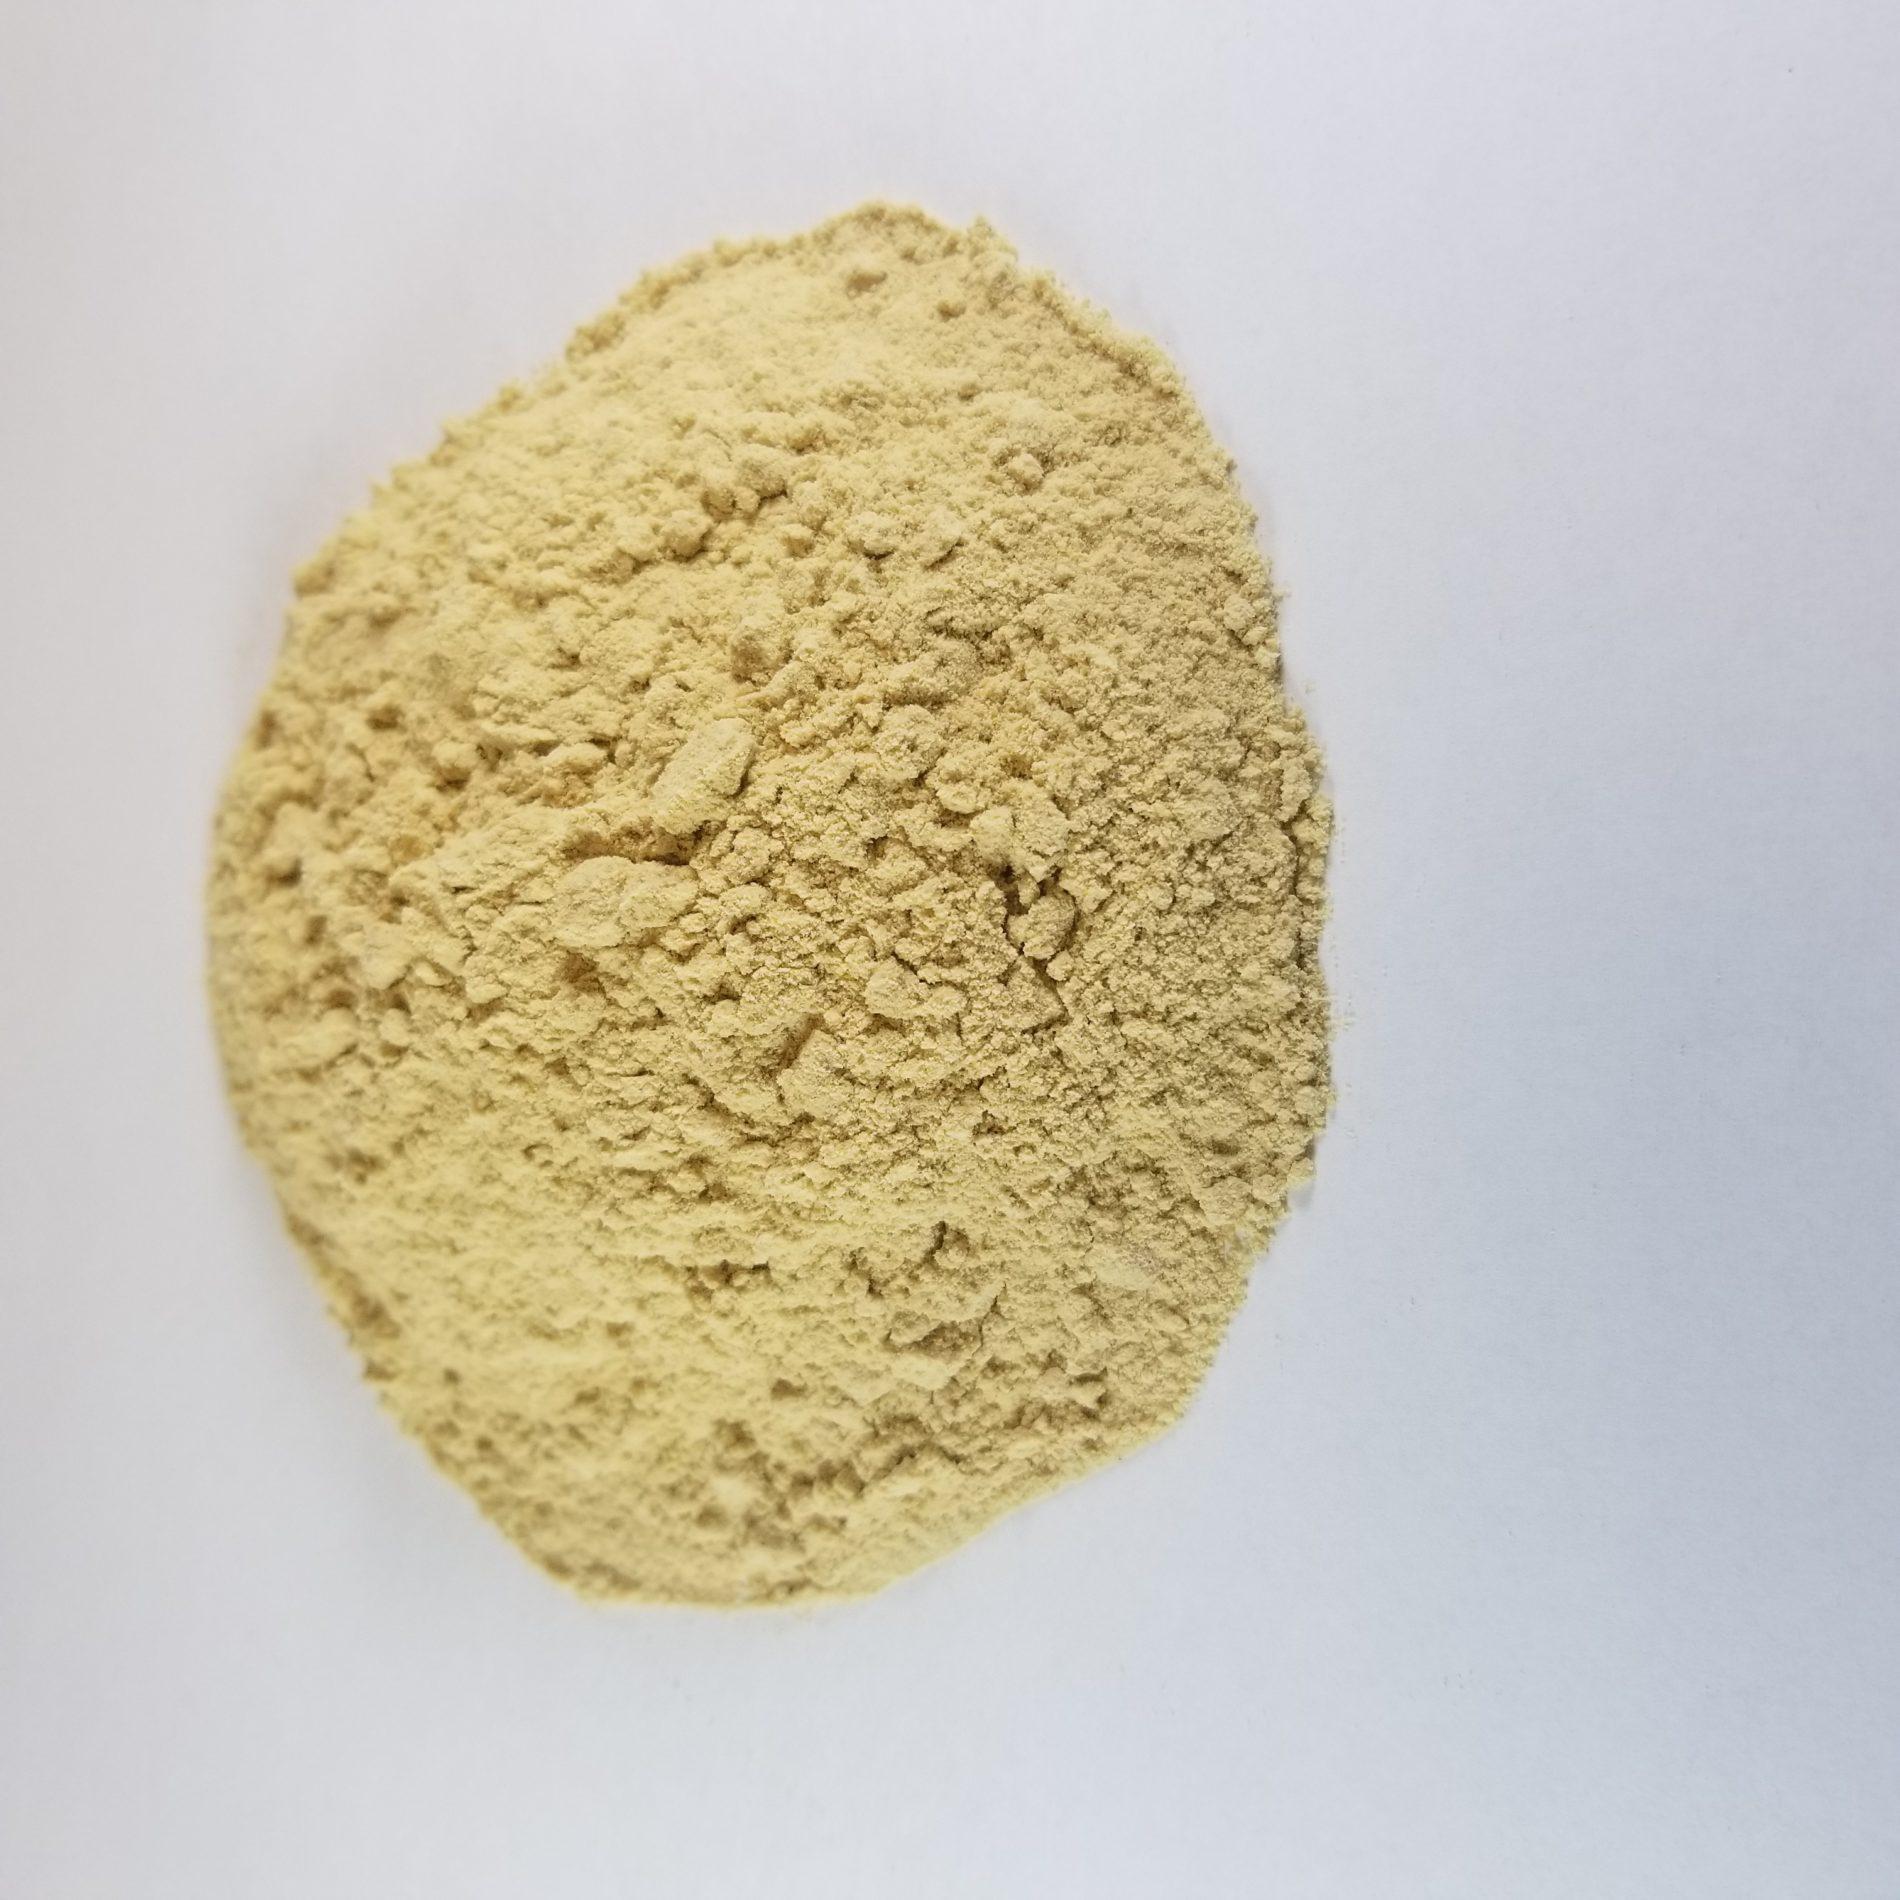 Organic Garbanzo Bean Powder, 50LB Bag